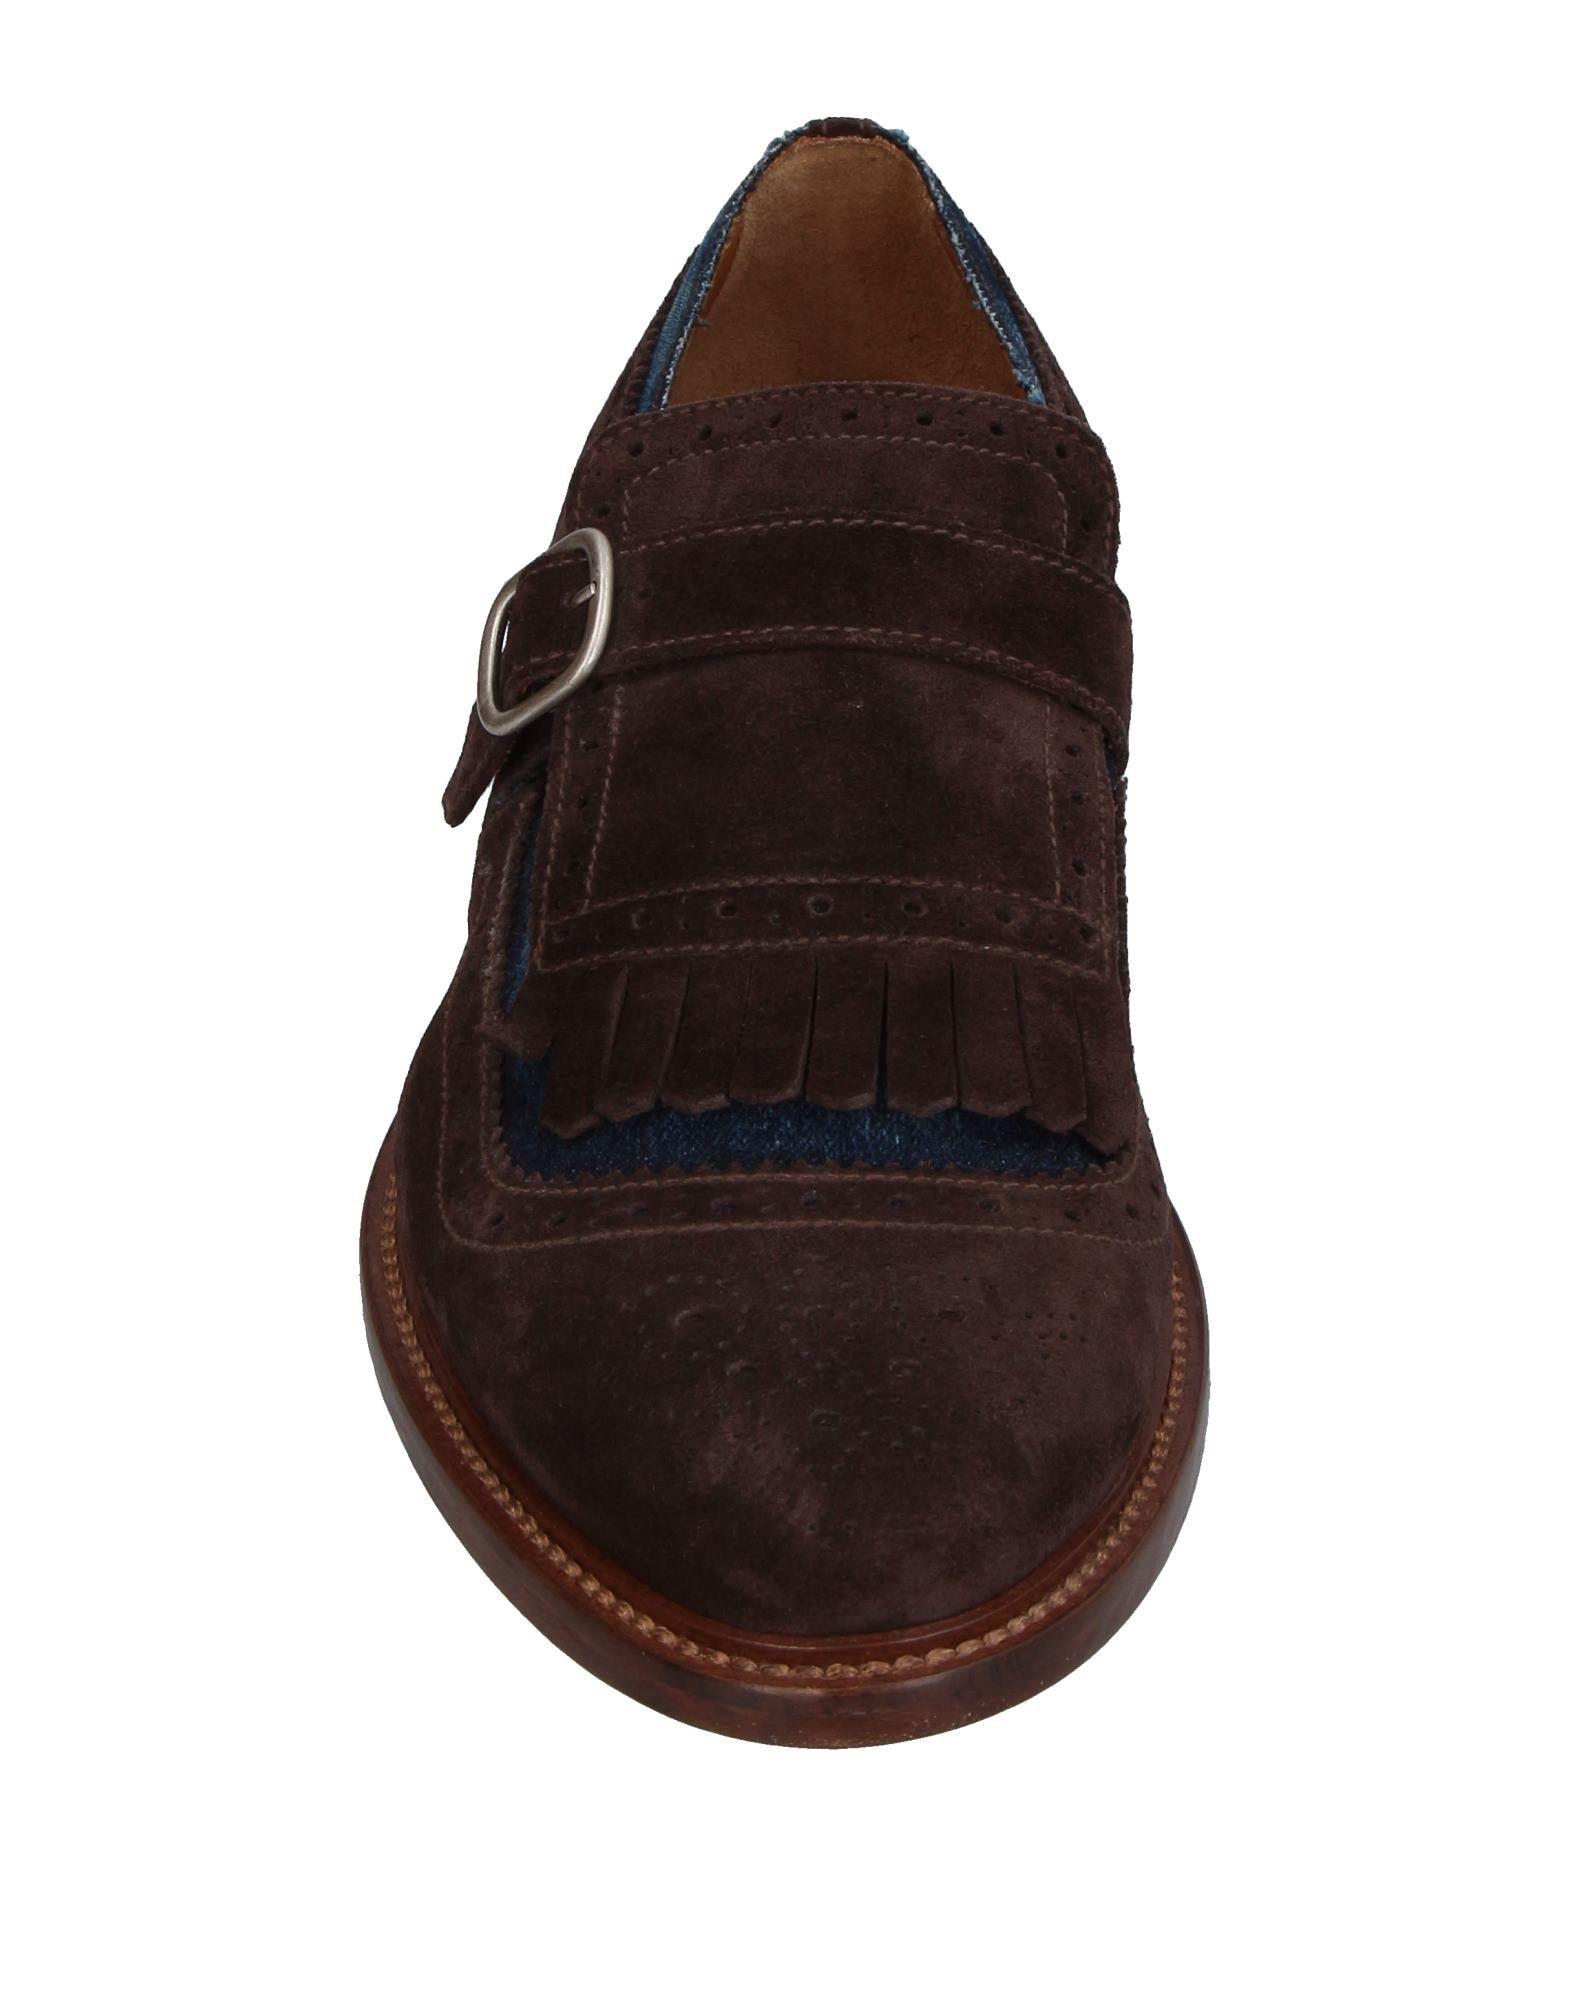 Doucal's Mokassins Heiße Herren  11407571QU Heiße Mokassins Schuhe 2964c4